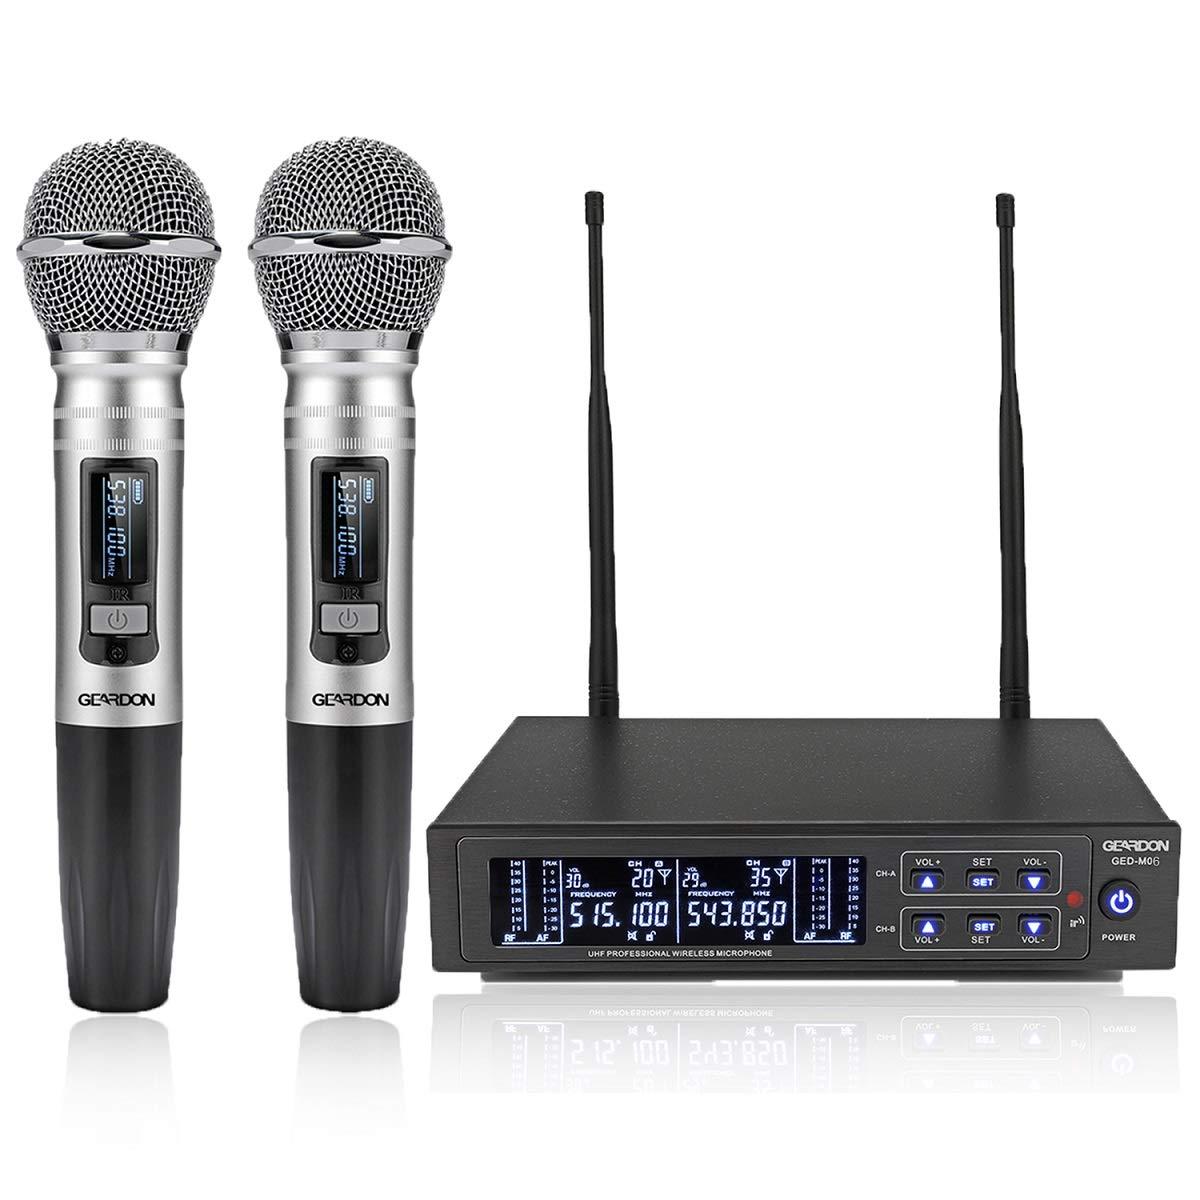 GEARDON Dual Wireless Microphone System, 200 Channel UHF Metal Cordless Handheld Mic Set with 250ft Long Range Professional Performance for Presentation/Church/Karaoke by GEARDON